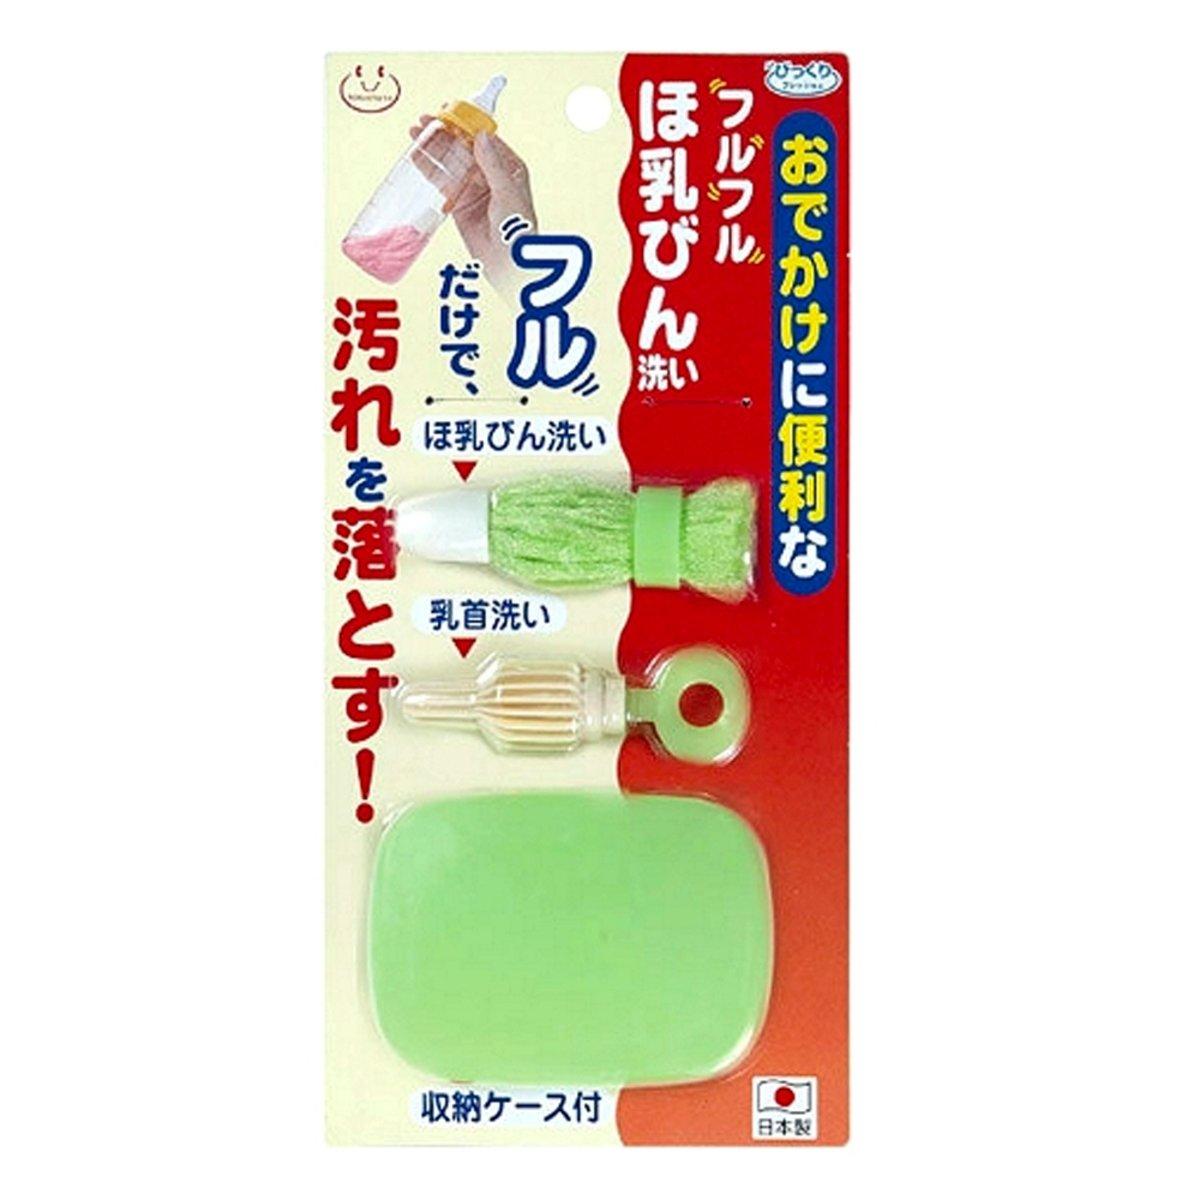 SANKO Portable Bottle Brush Box (Green)